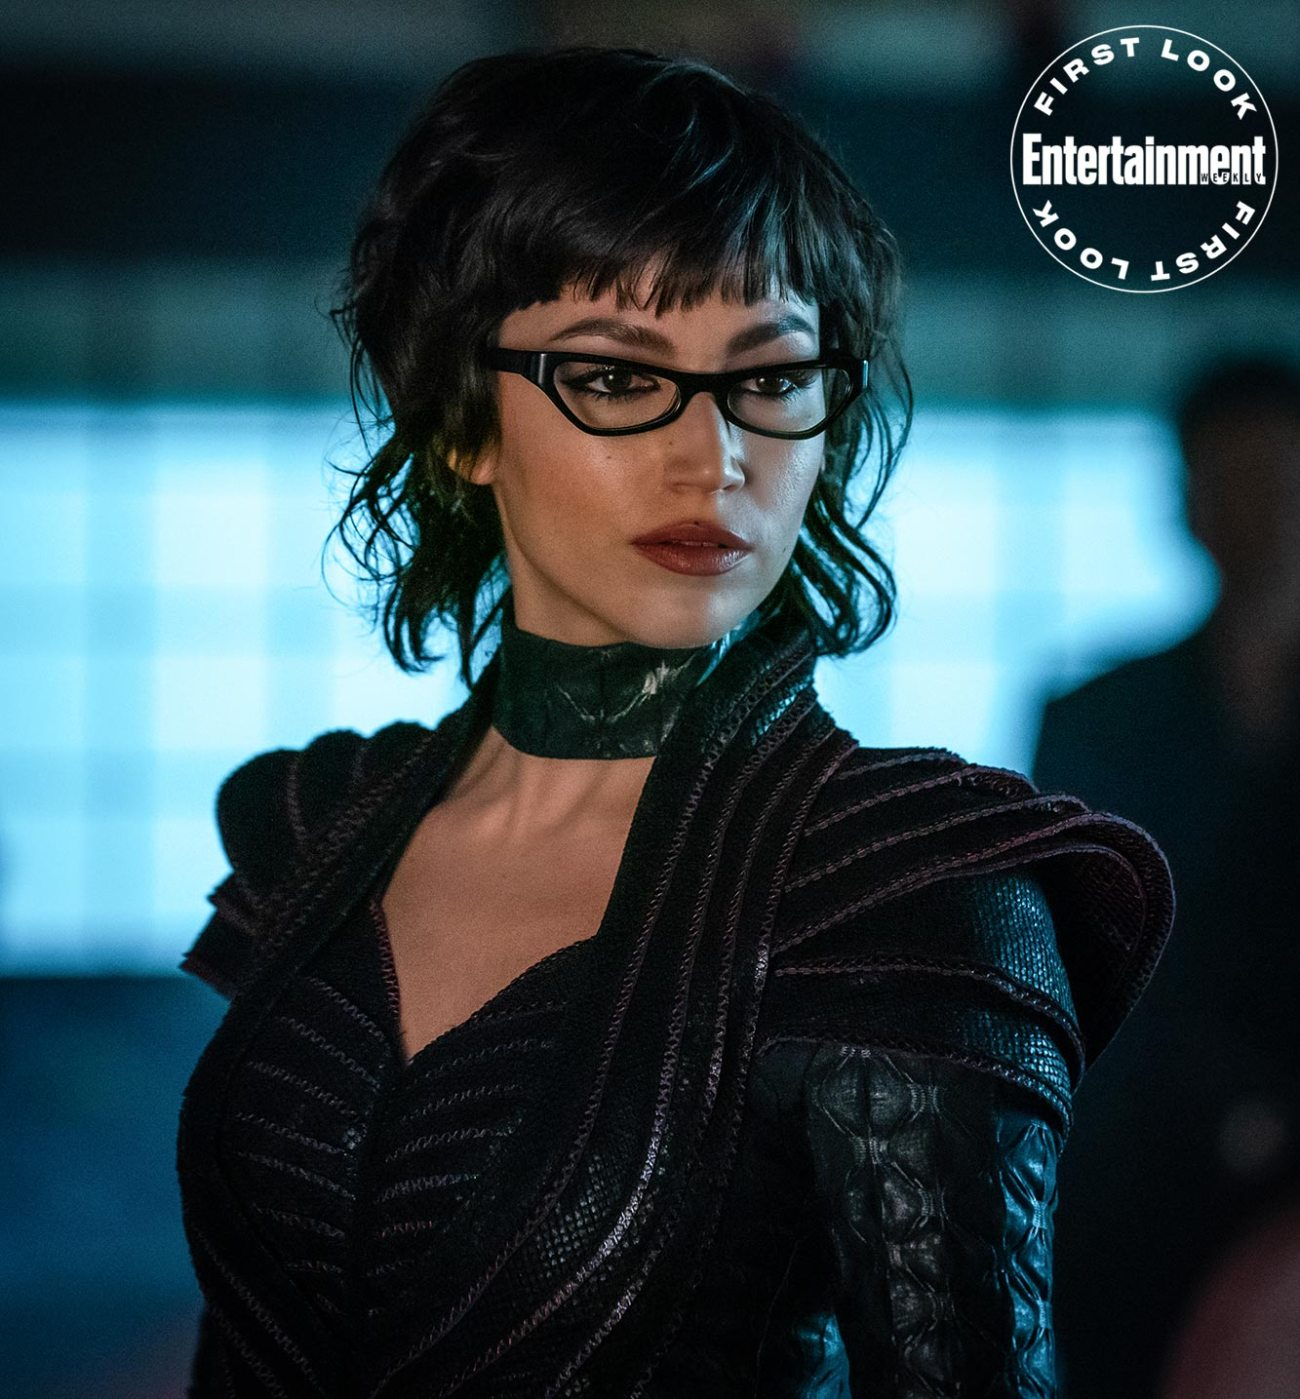 The Baroness (Úrsula Corberó) en Snake Eyes: G.I. Joe Origins (2021). Imagen: Niko Tavernese/Paramount Pictures/Entertainment Weekly